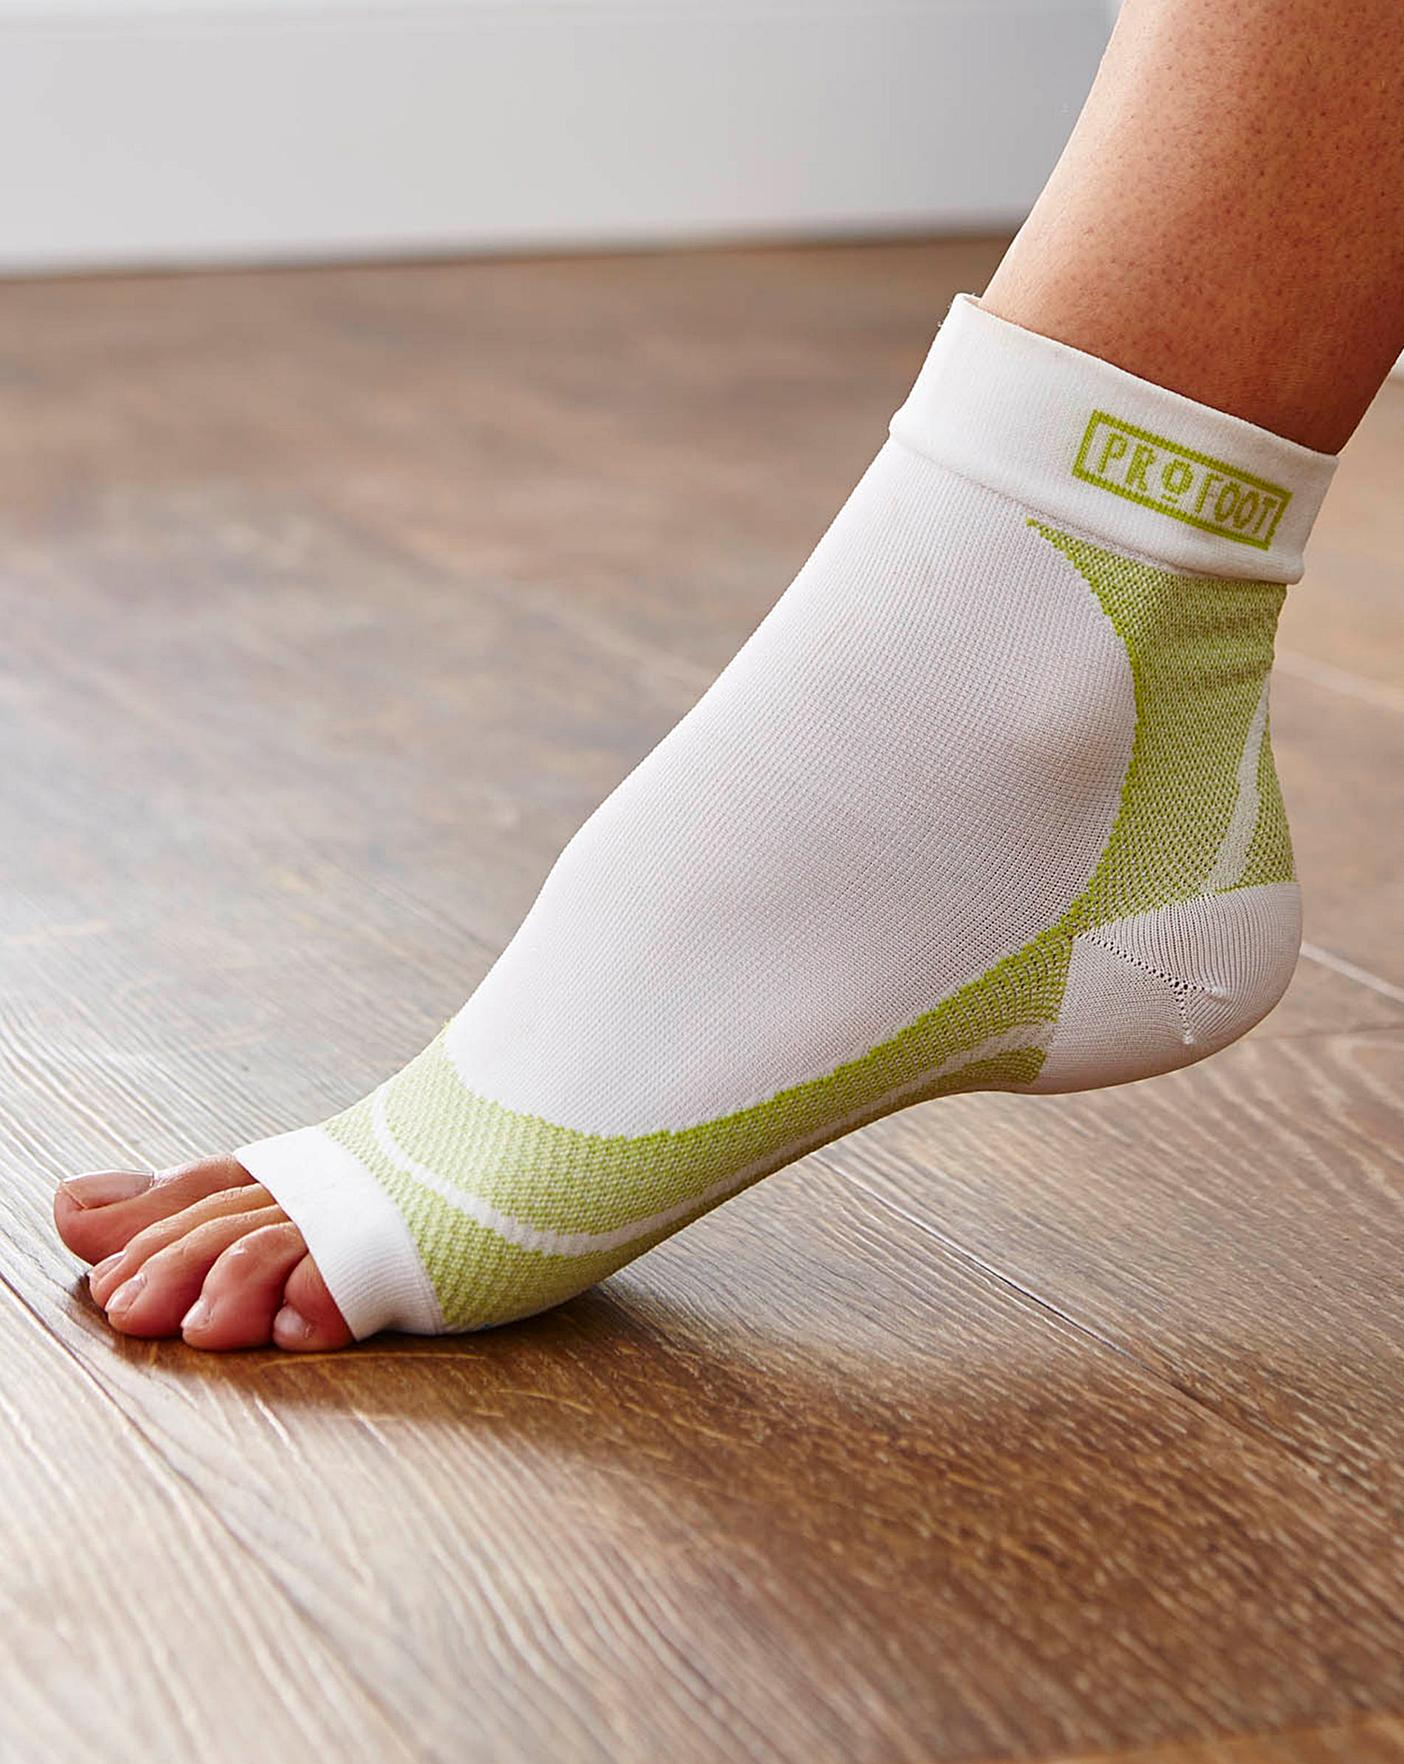 Surprising Plantar Fasciitis Foot Support Customarchery Wood Chair Design Ideas Customarcherynet